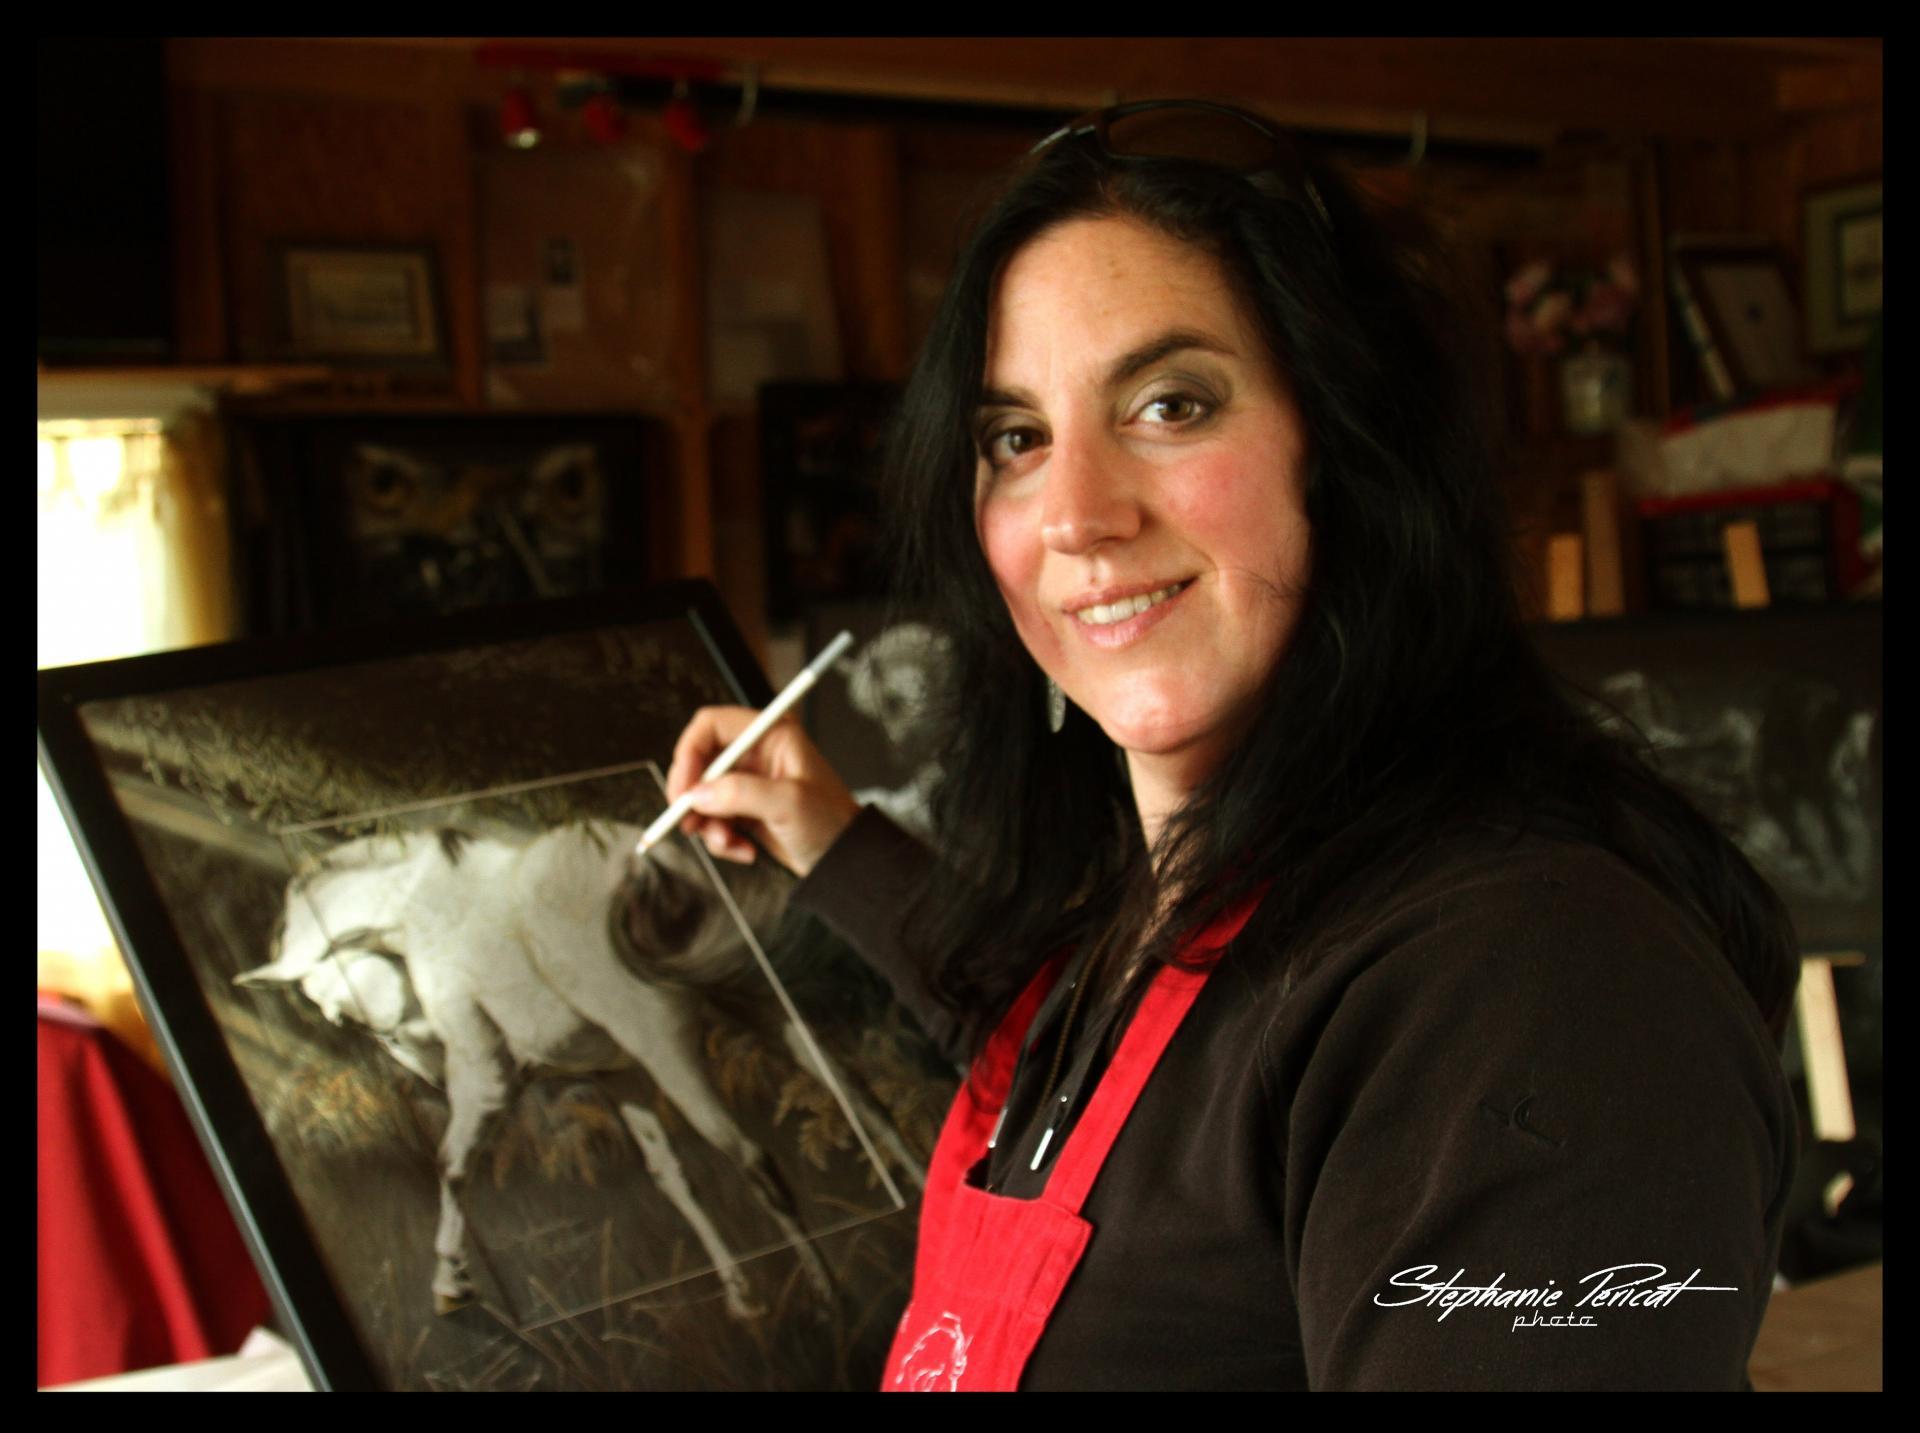 Stephanie pericat artiste pastelliste copie